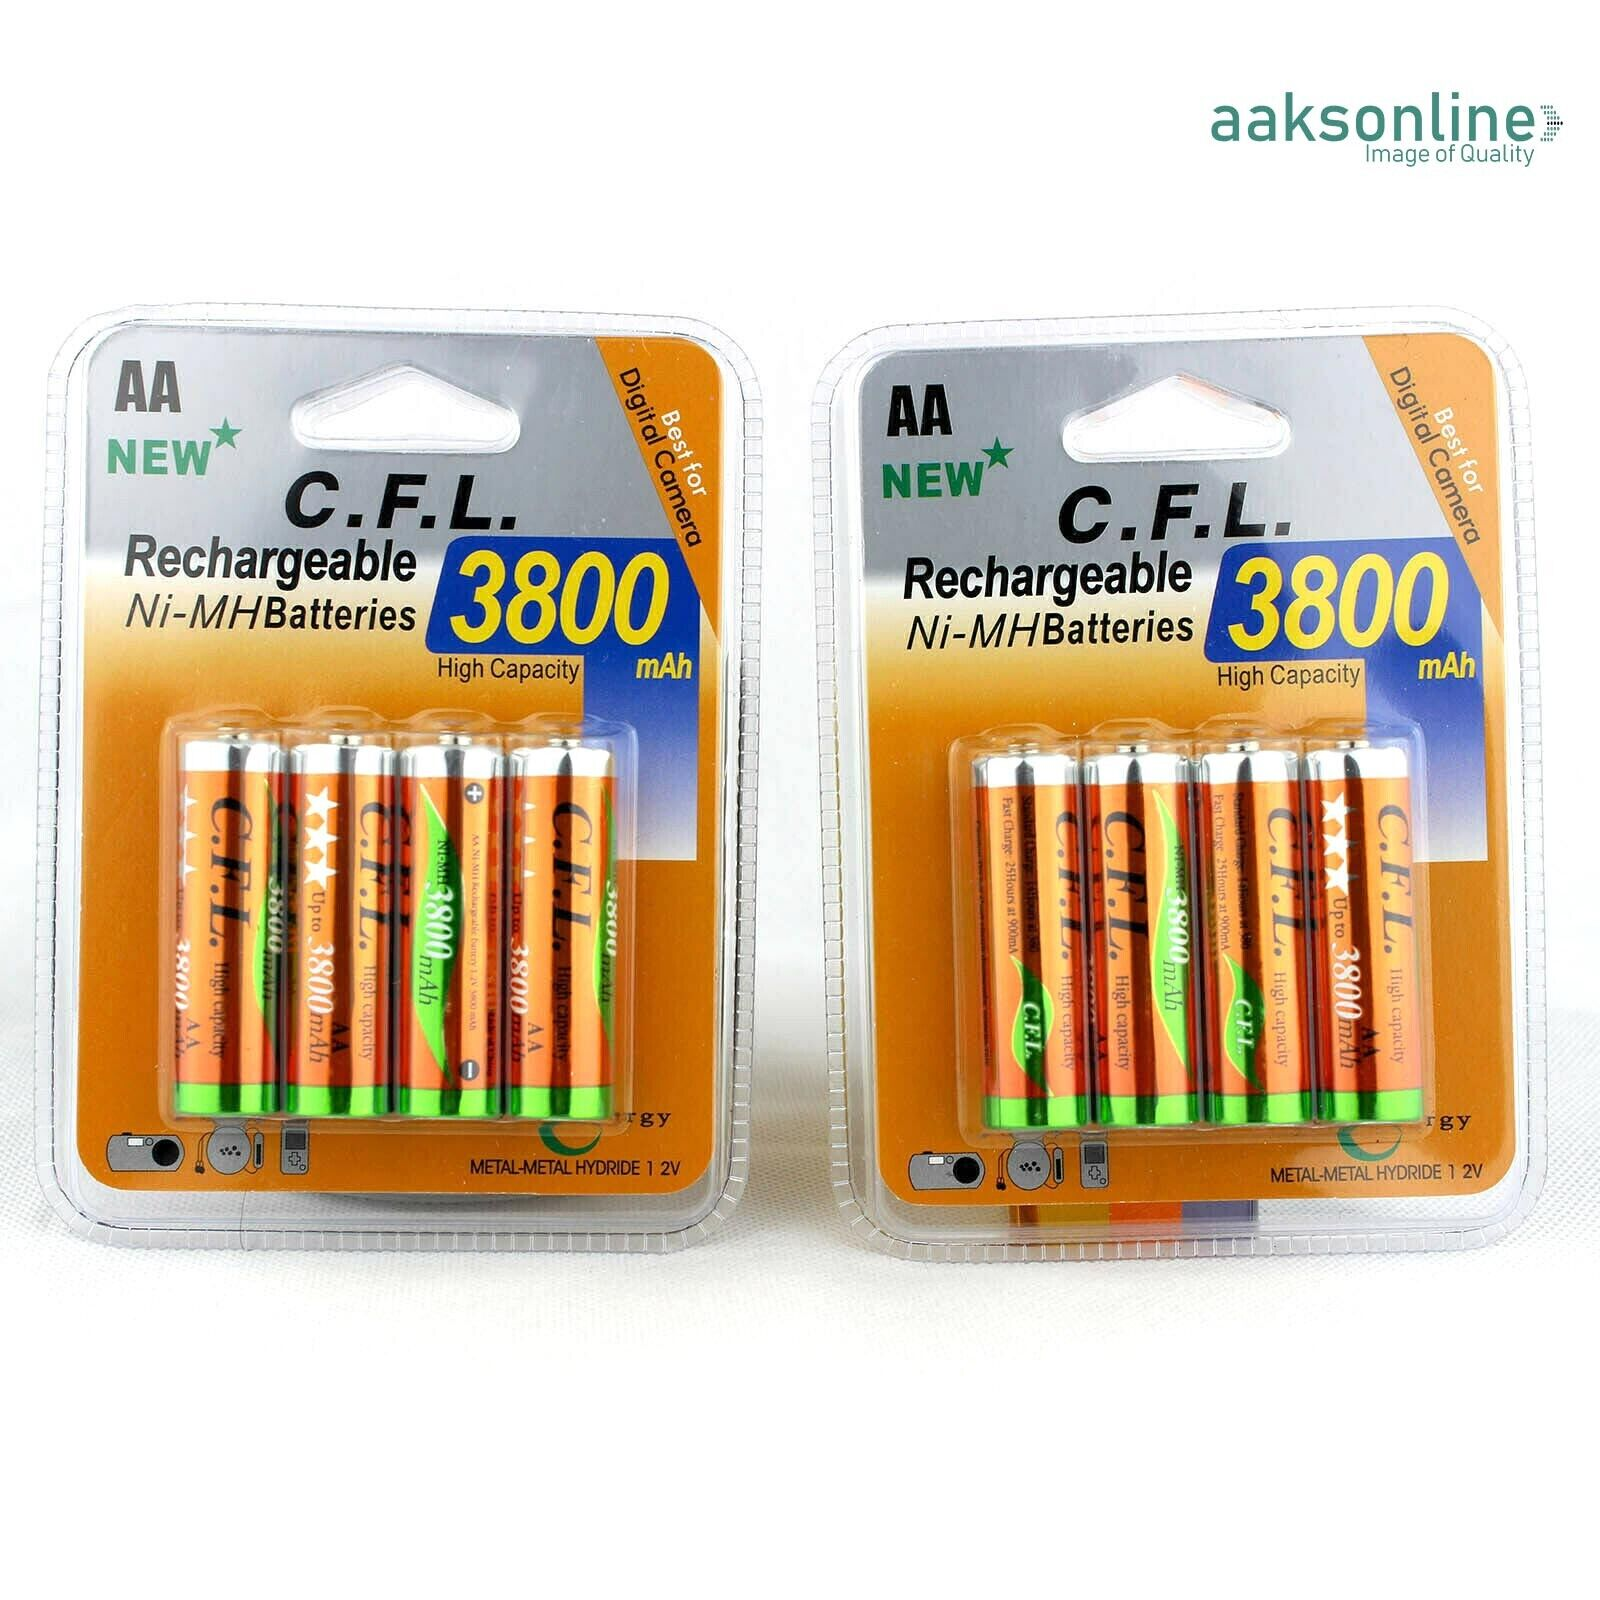 8x AA 3800 mAh AKKU NI-MH Wiederaufladbar Accu Rechargeable Batterien Mignon TOP